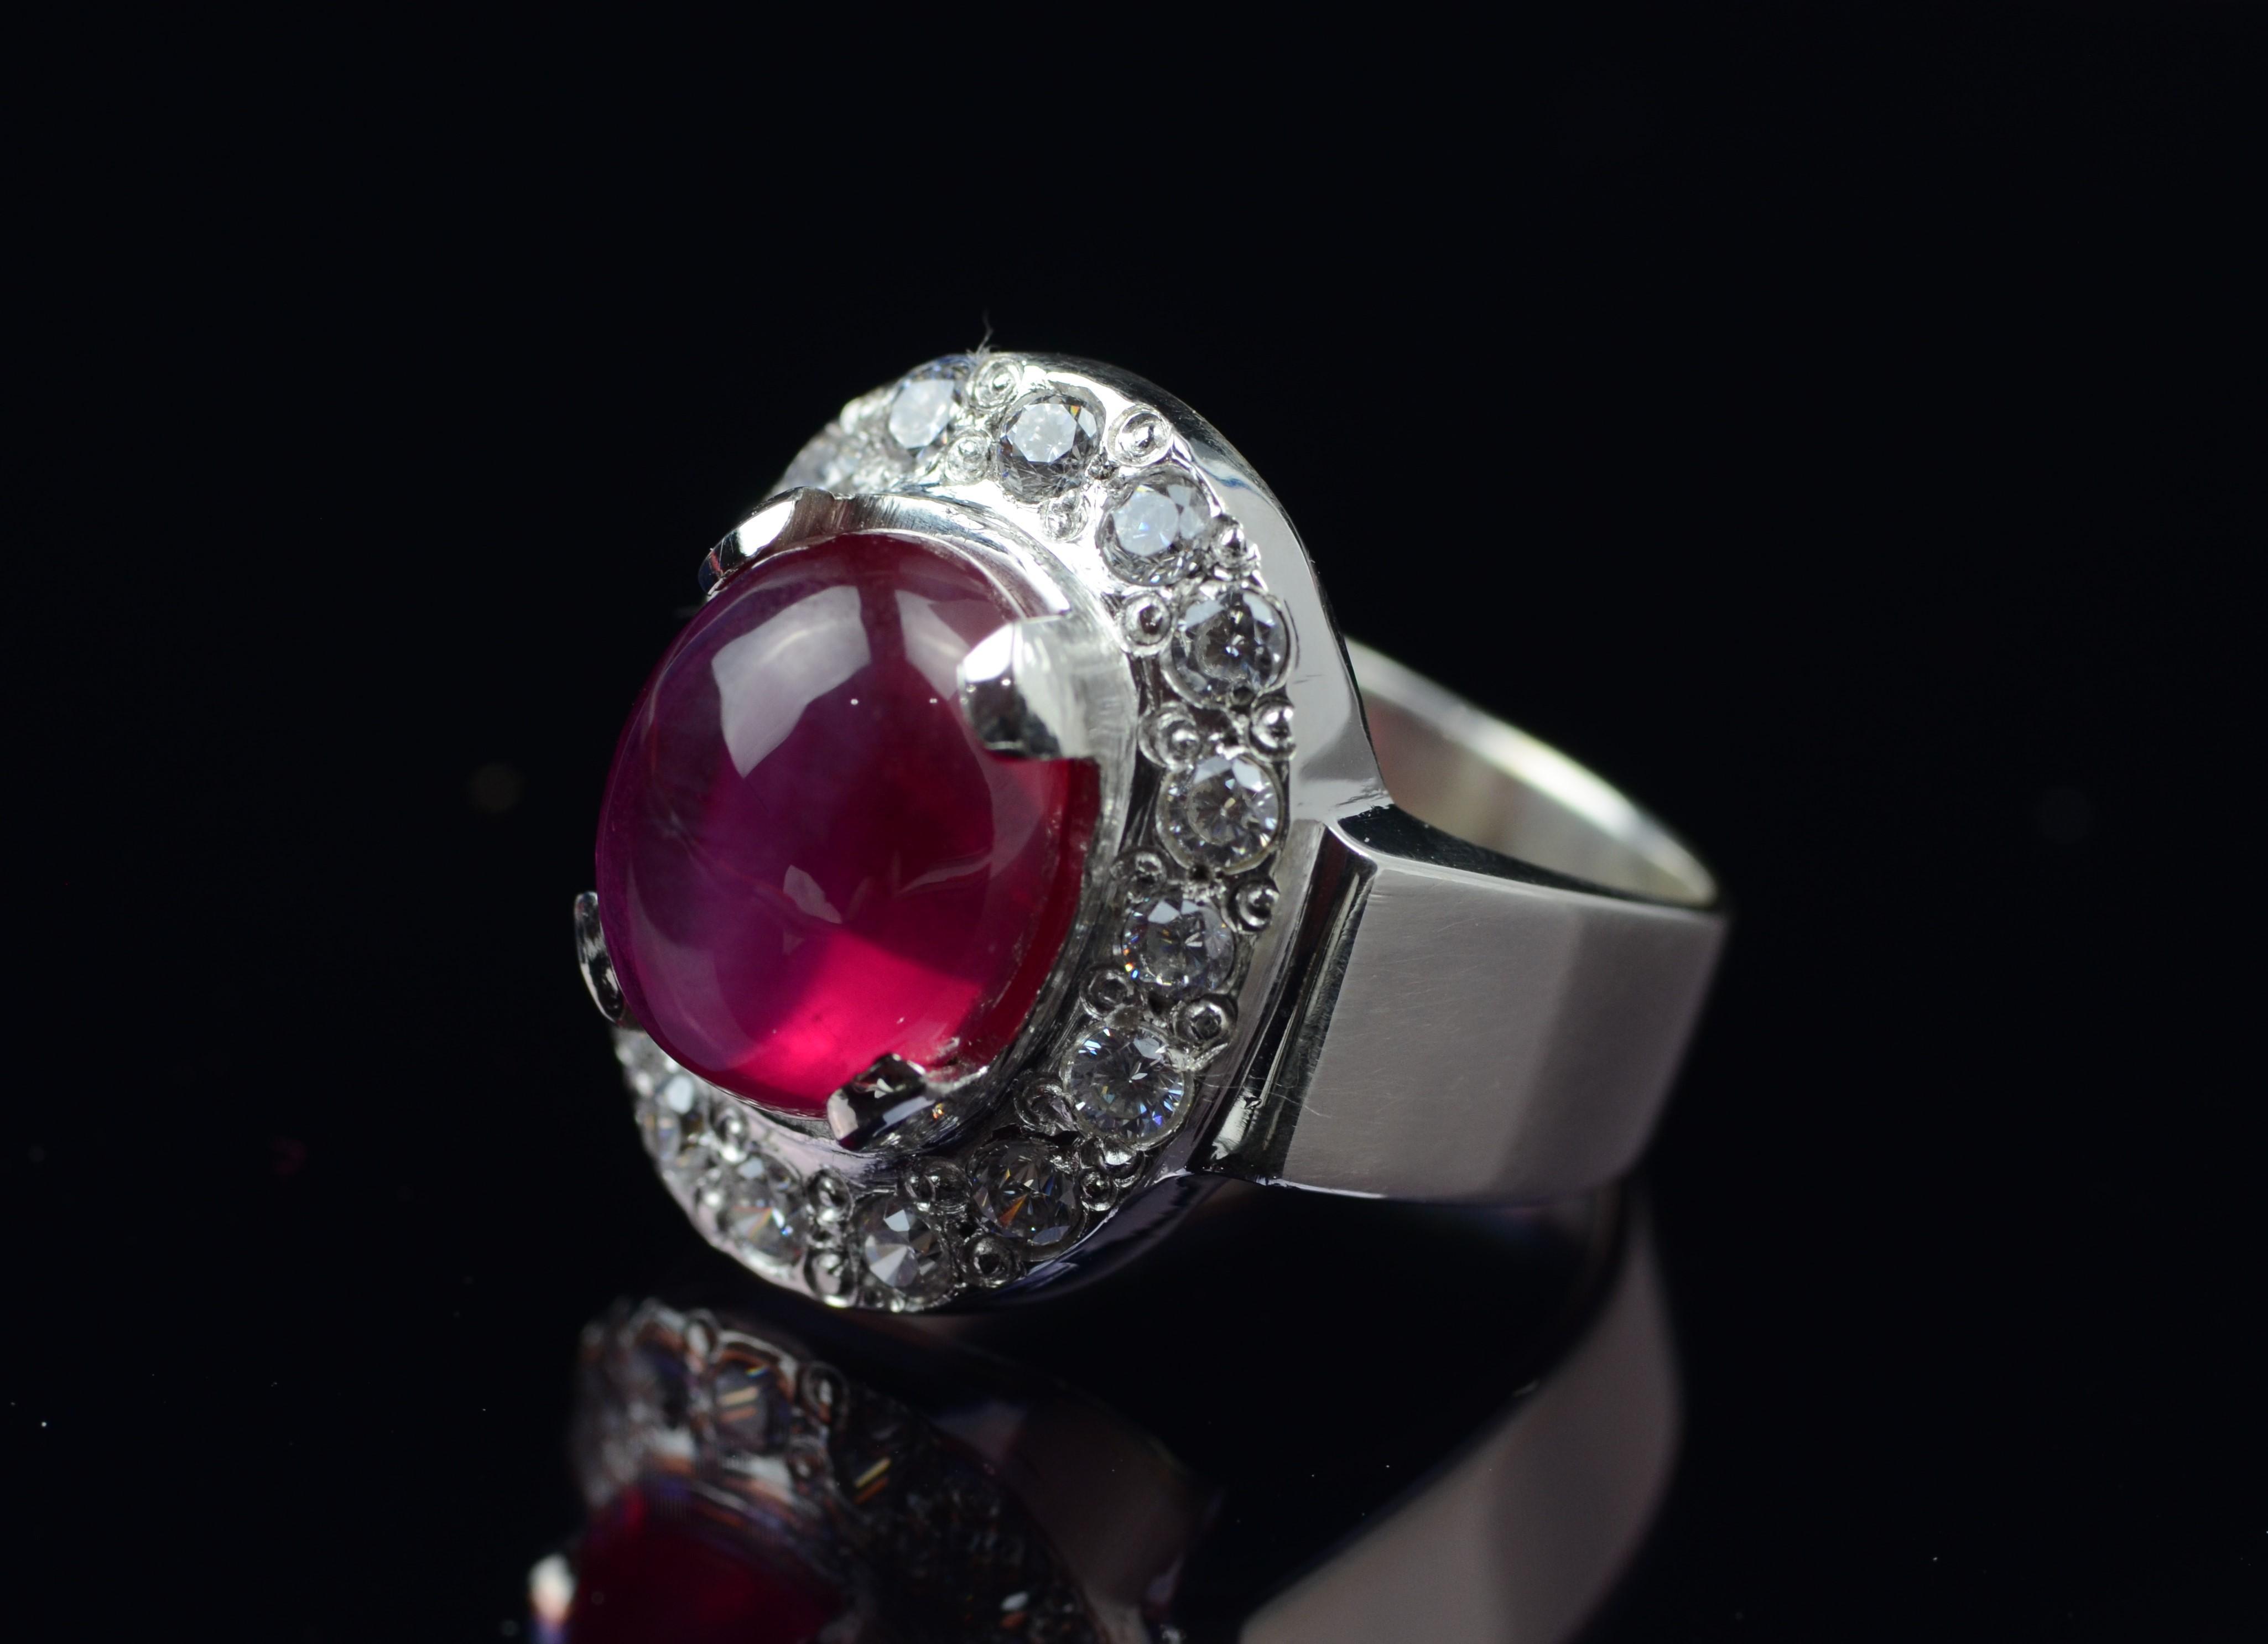 06416b976b3 Elegant Design Women Ruby Ring Ruby Star Ring Sterling Silver 925 Ring  Yaqoot Ring Ruby Pink Ring Ruby Girls Ring Handmade Ring